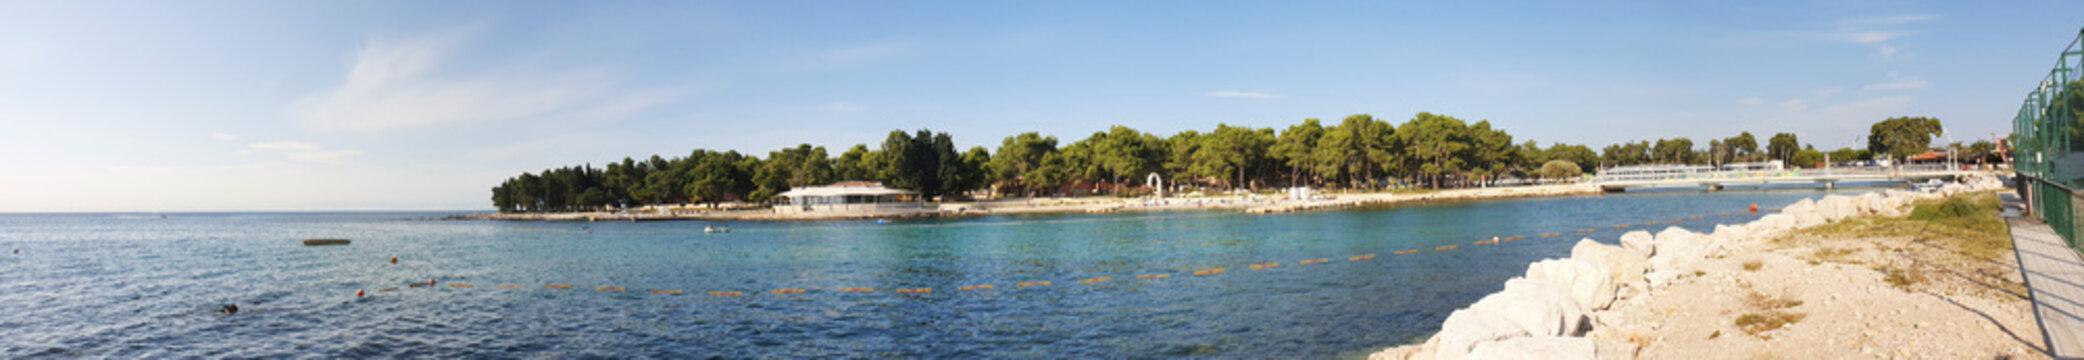 Plava Laguna in Monterol Kroatien